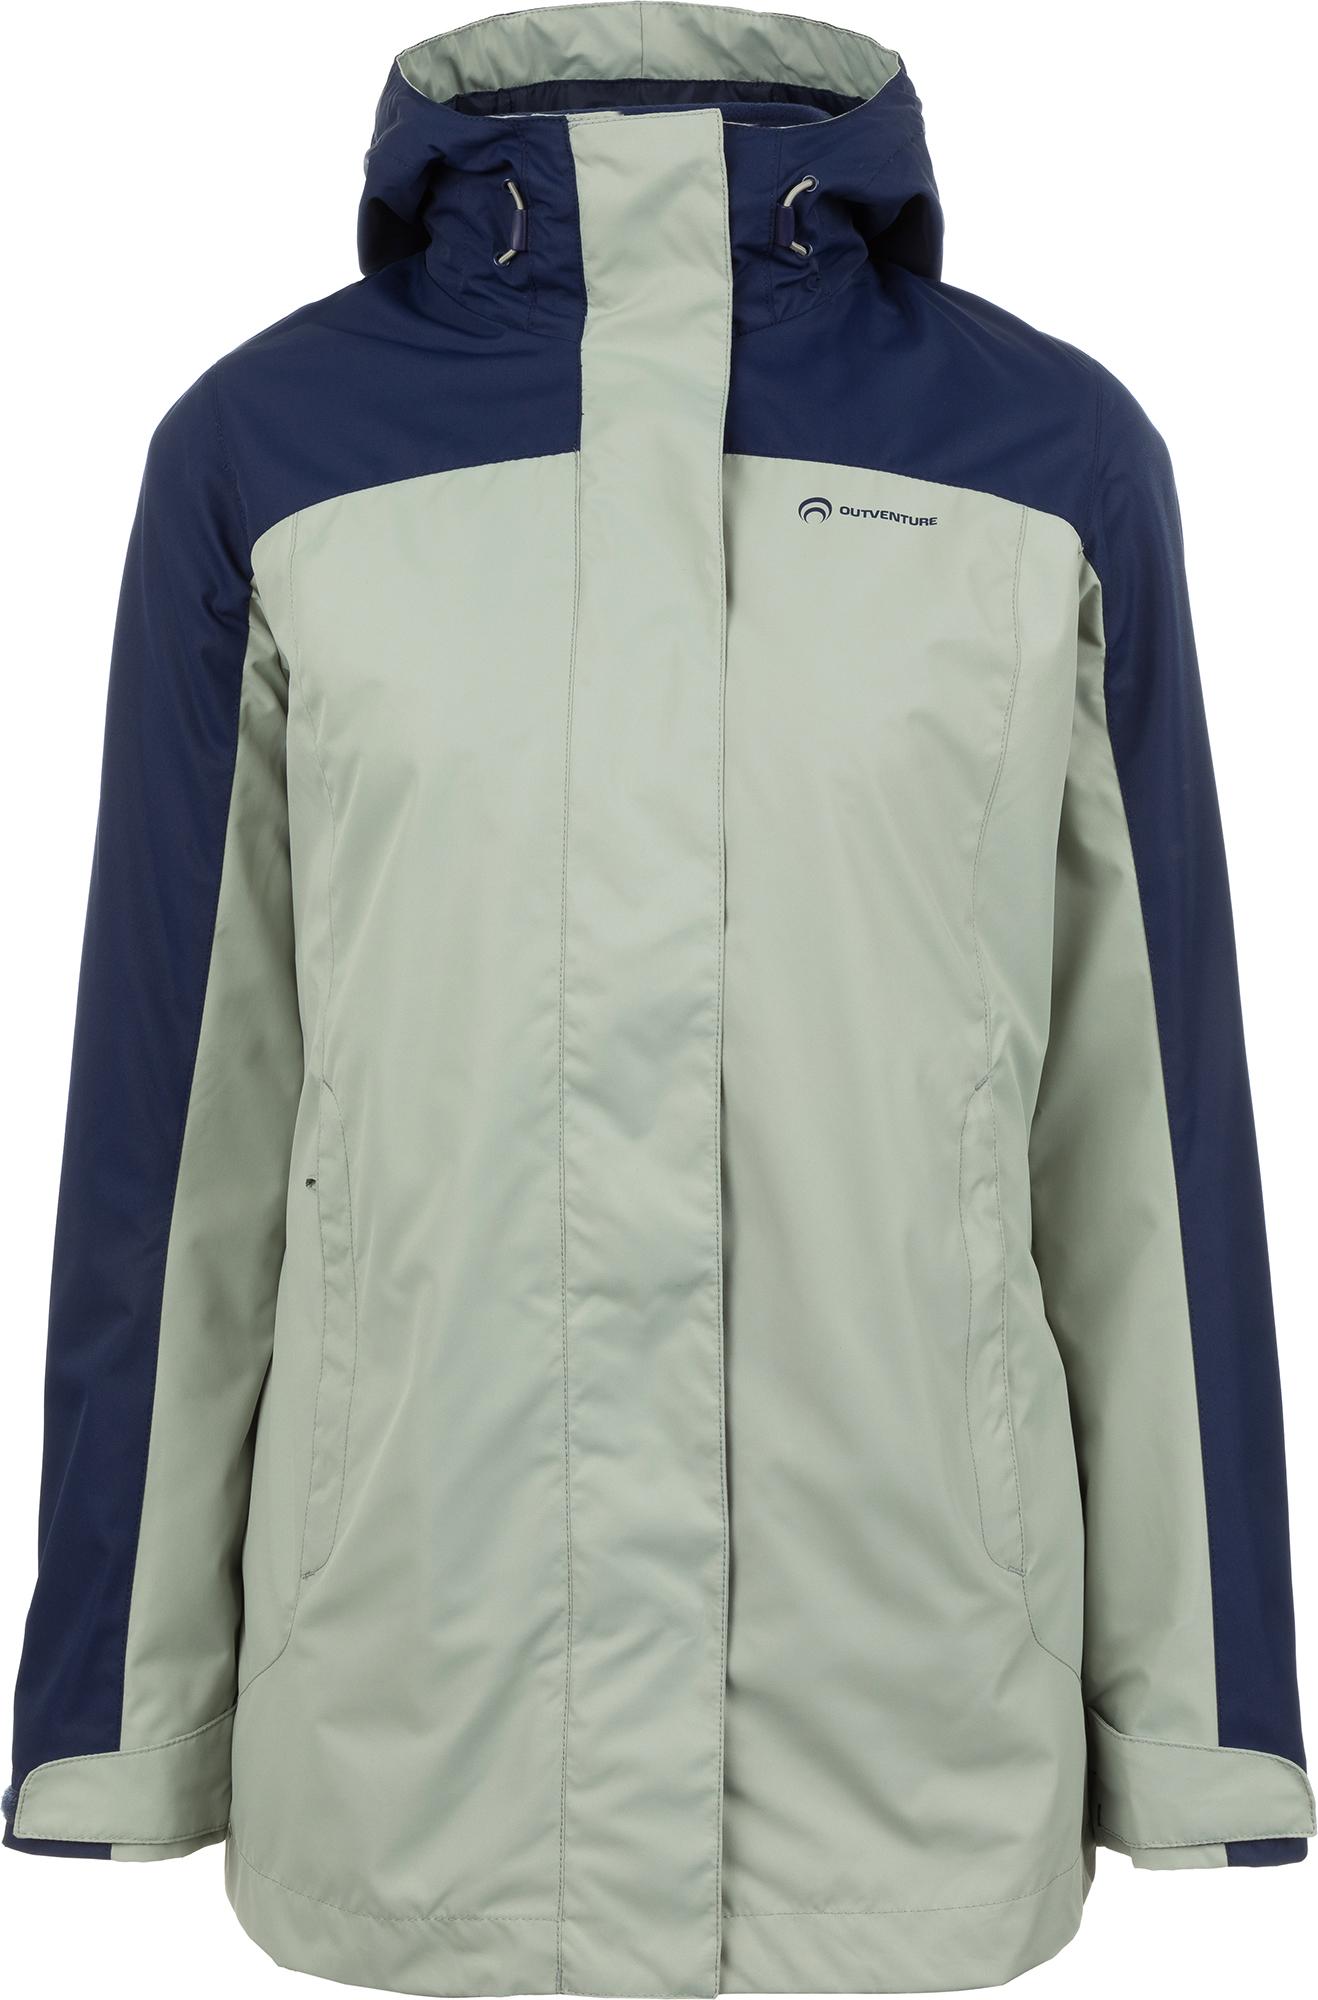 Outventure Куртка 3 в 1 женская Outventure, размер 54